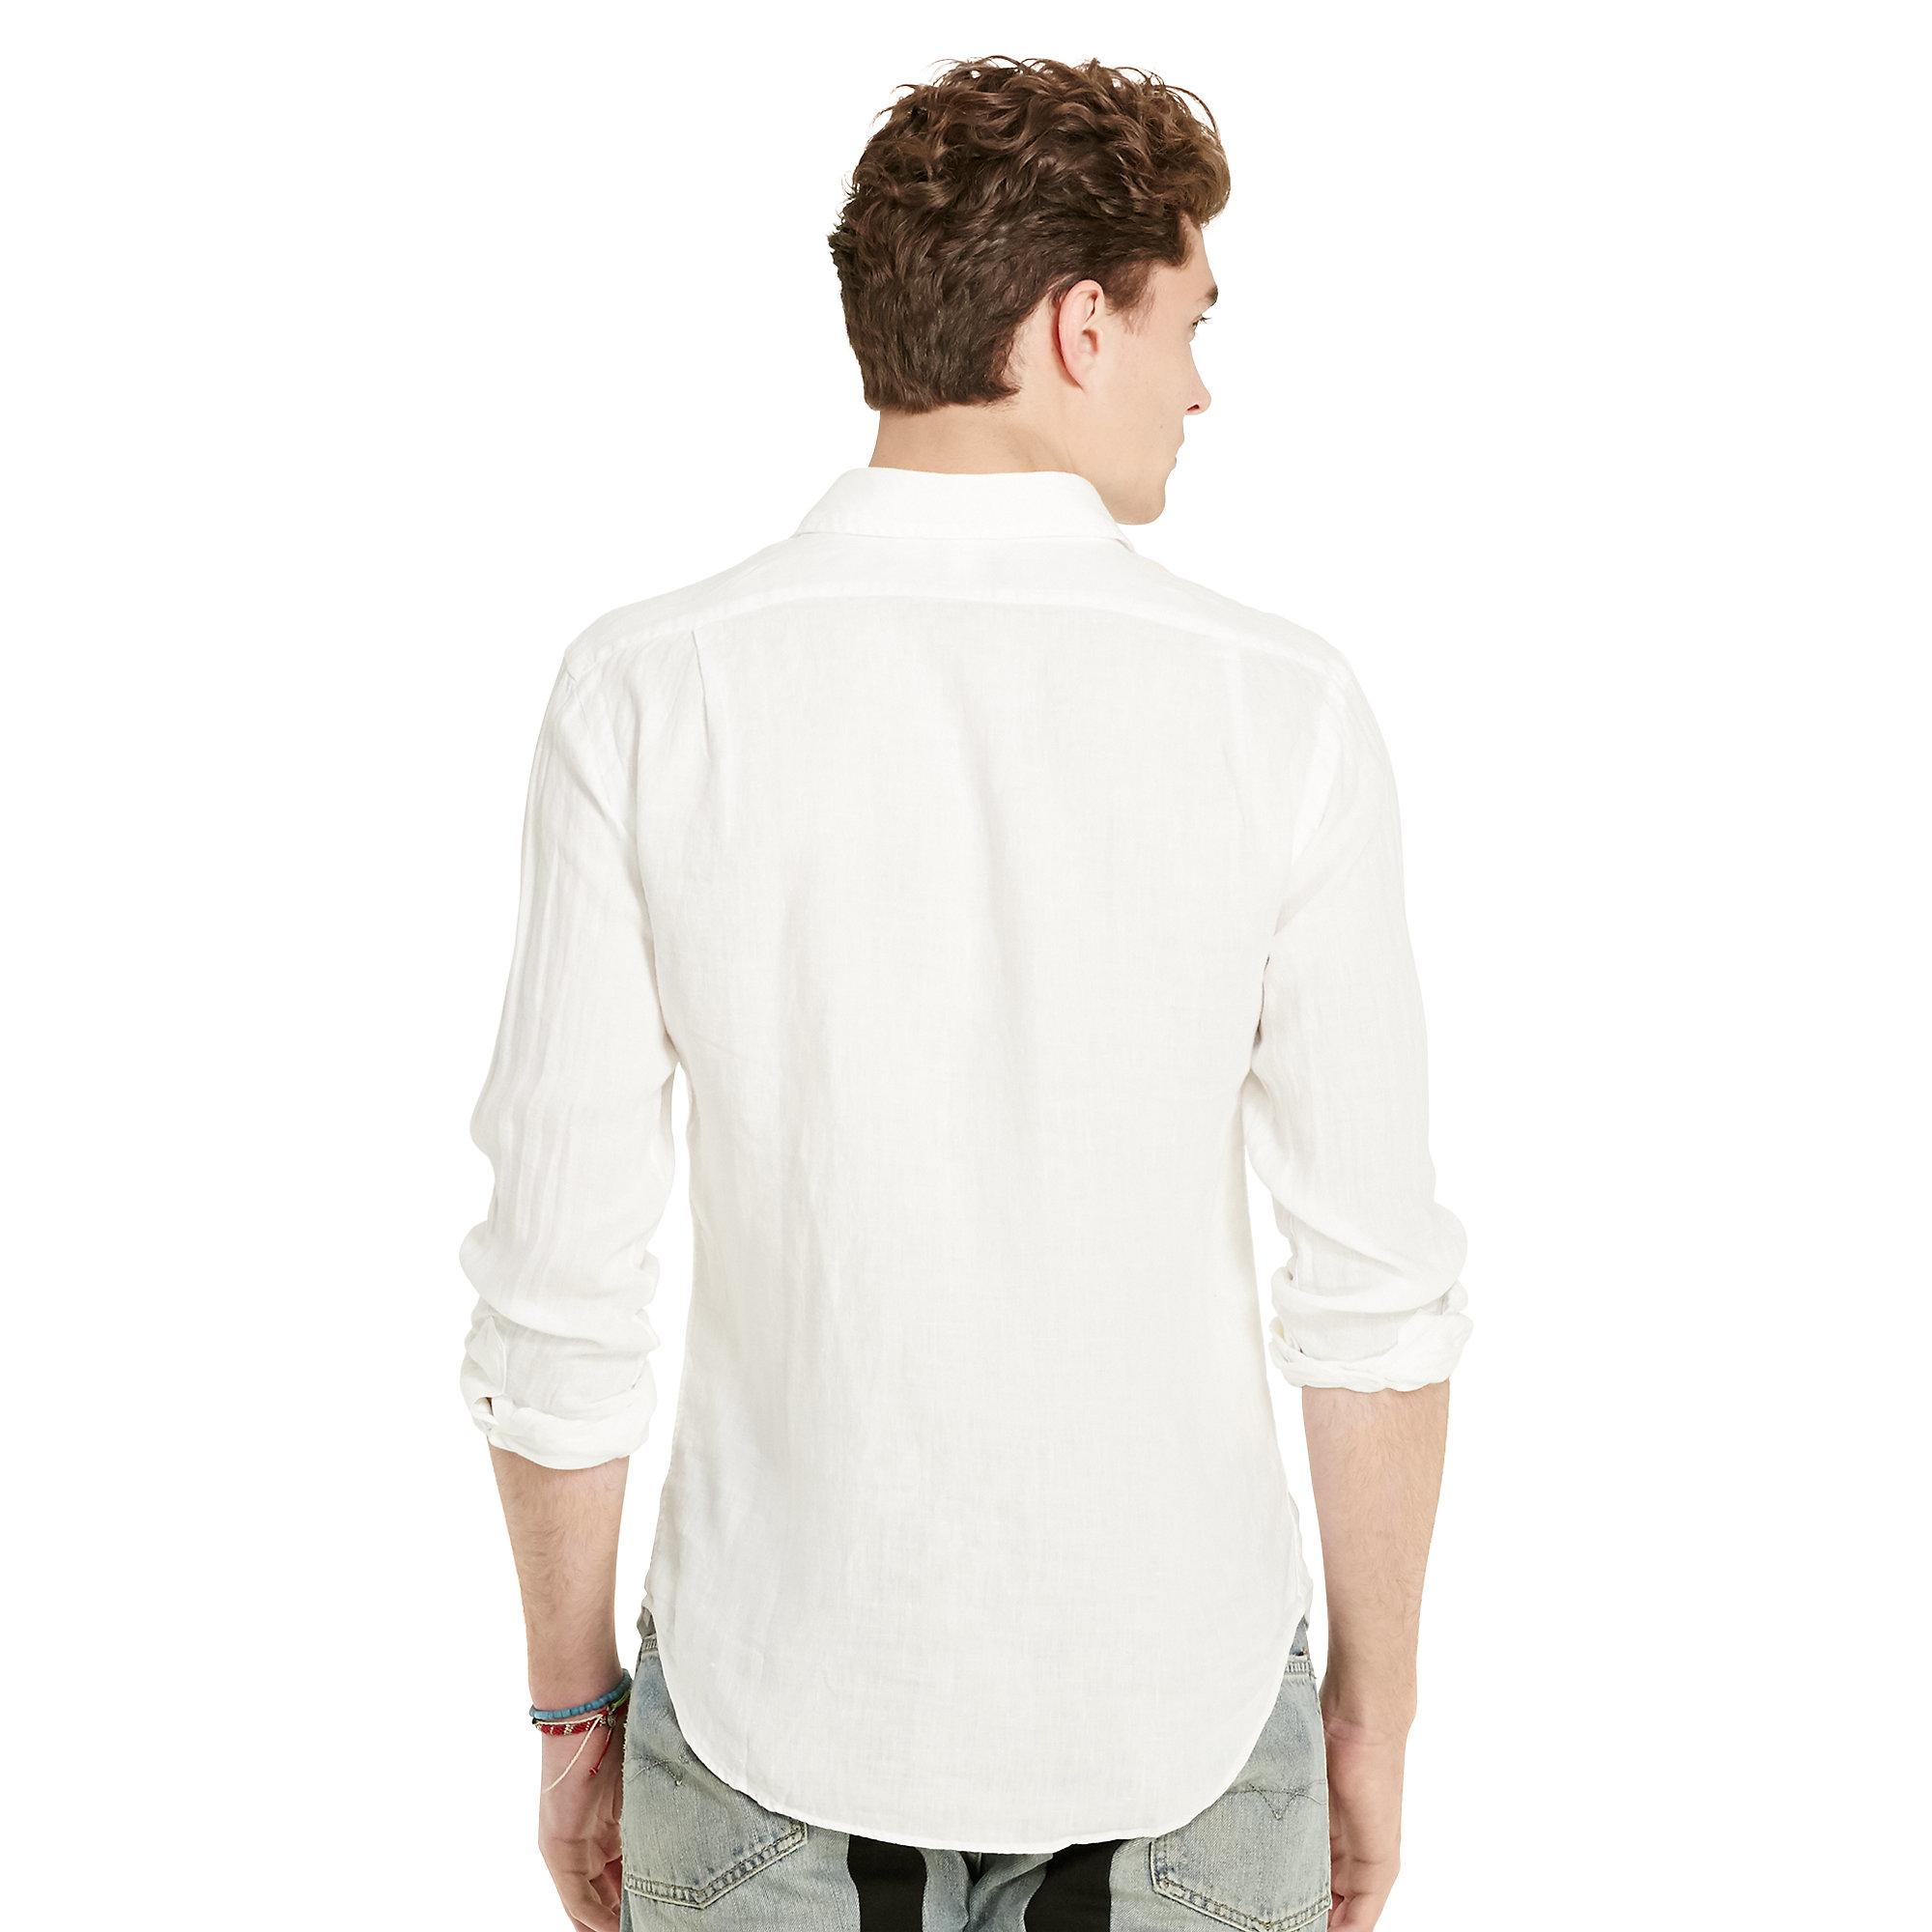 Polo ralph lauren estate slim fit linen shirt in white for for Slim fit white linen shirt